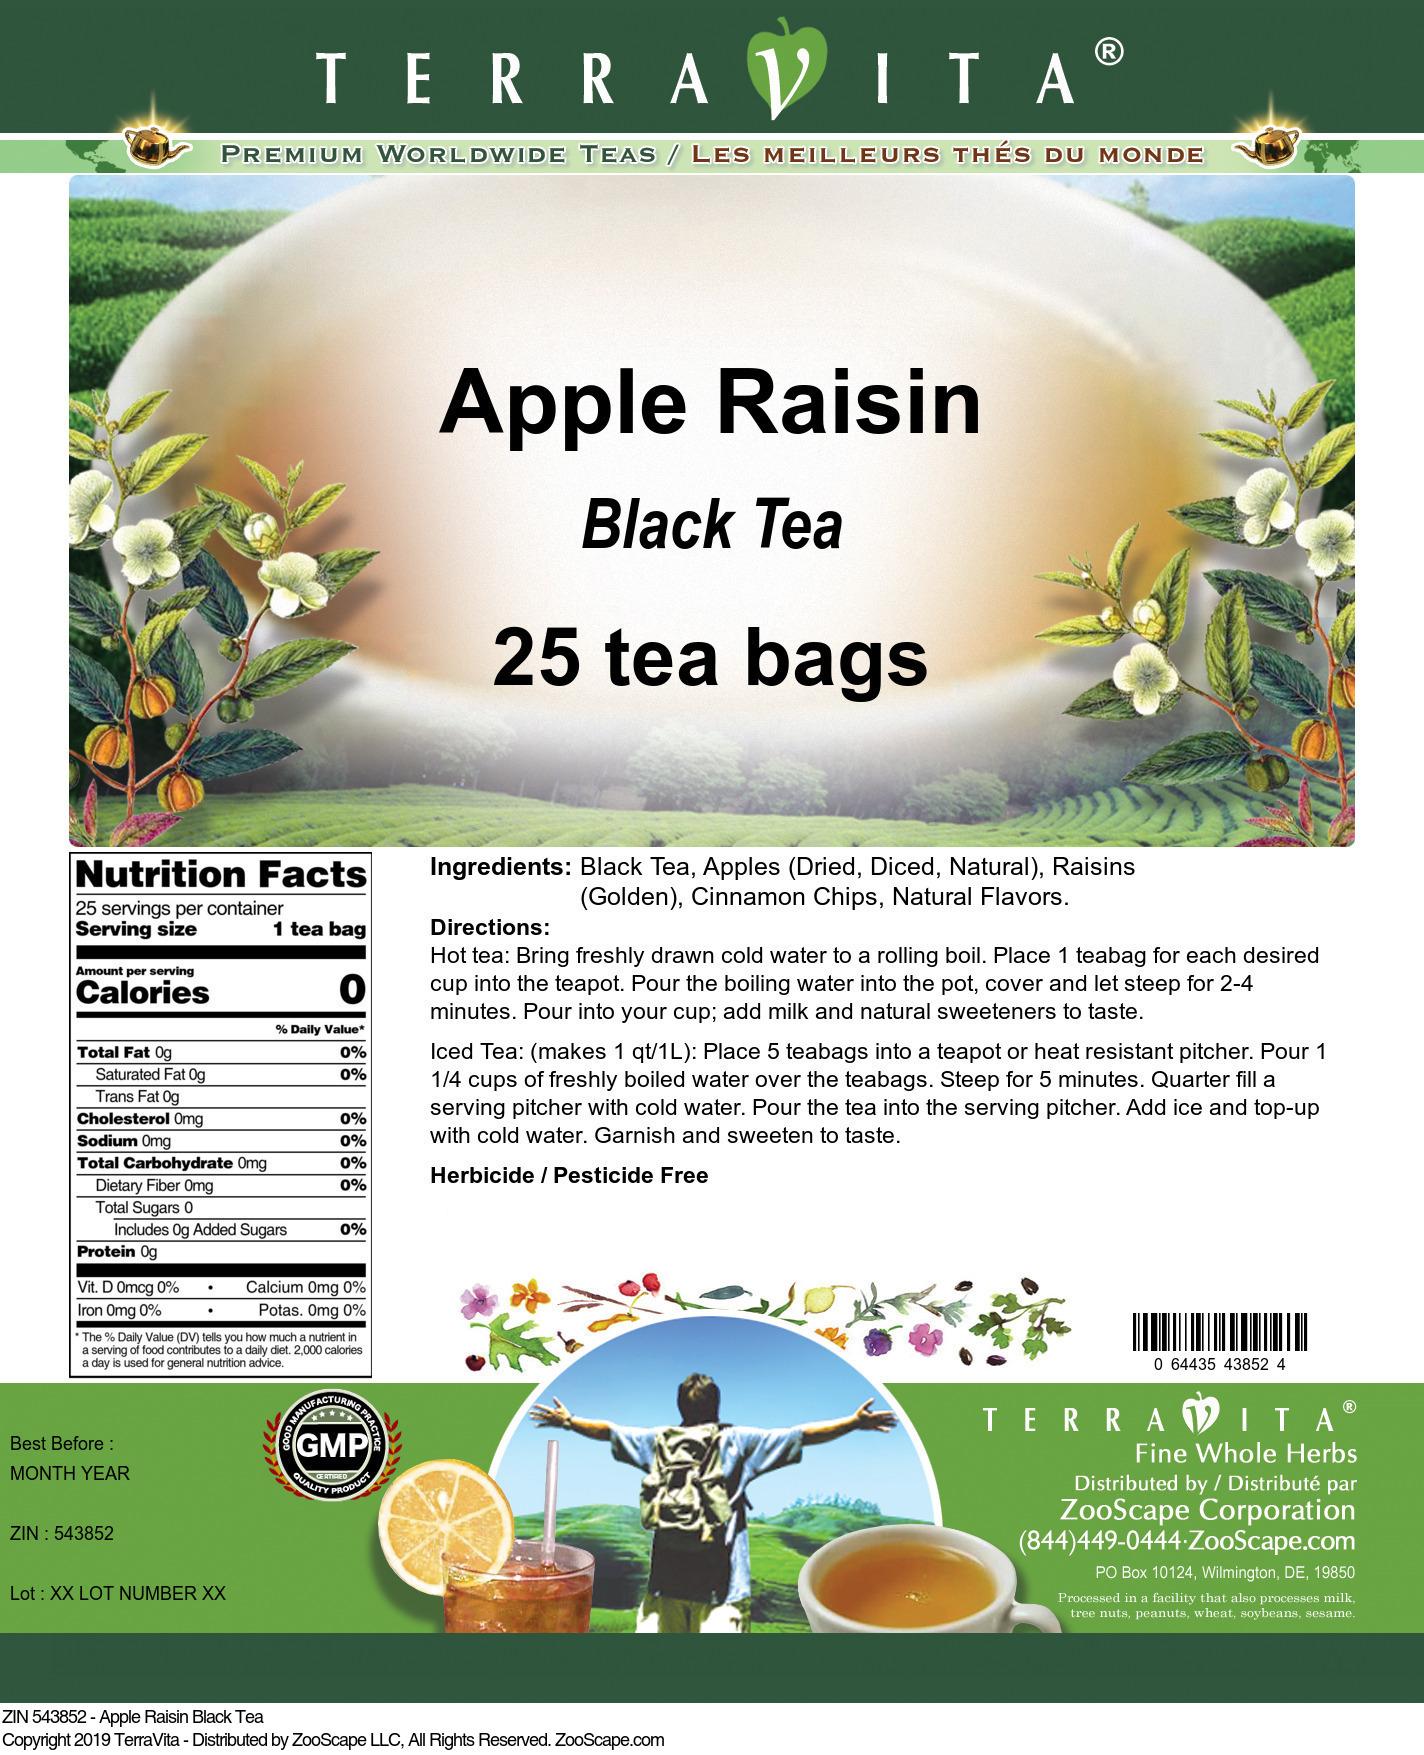 Apple Raisin Black Tea